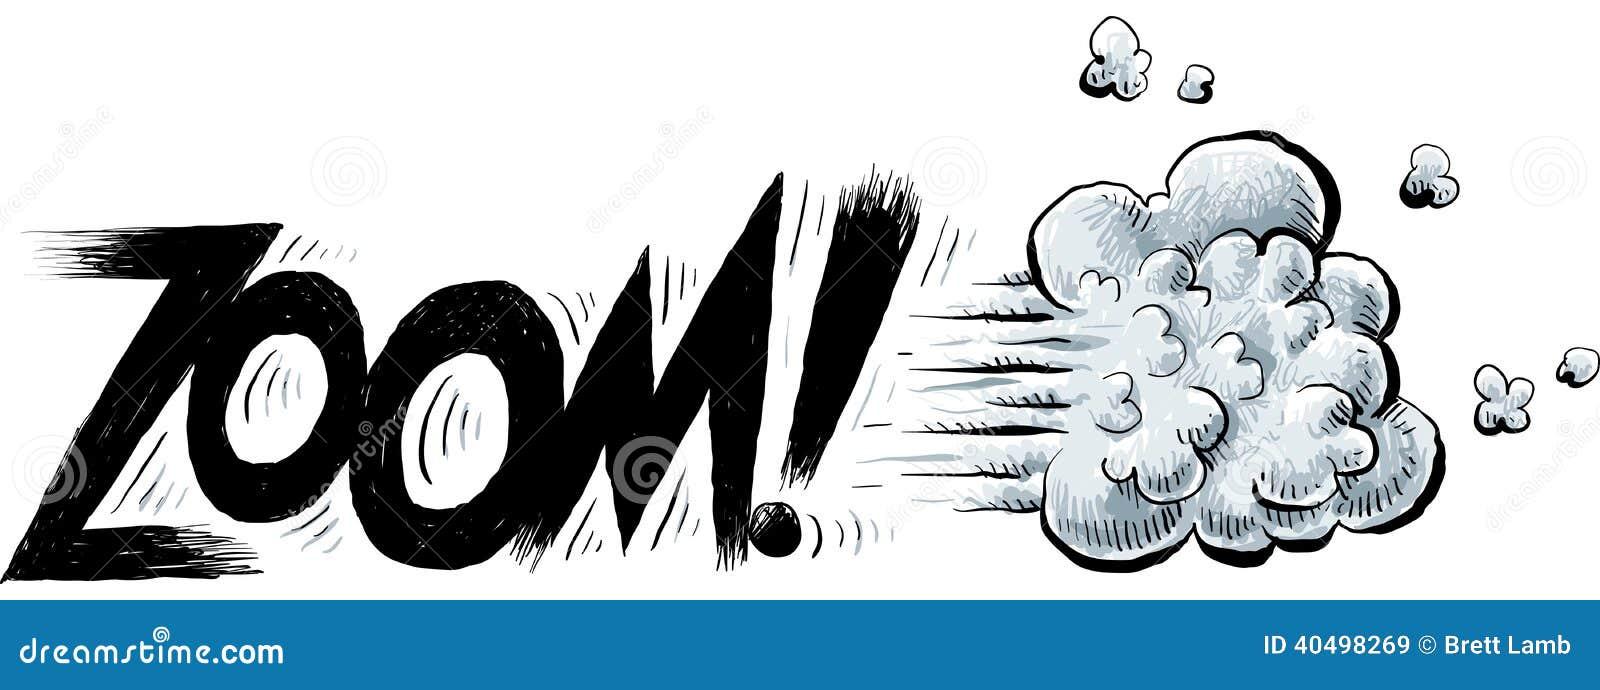 ZOOM Text stock vector. Illustration of cartoon